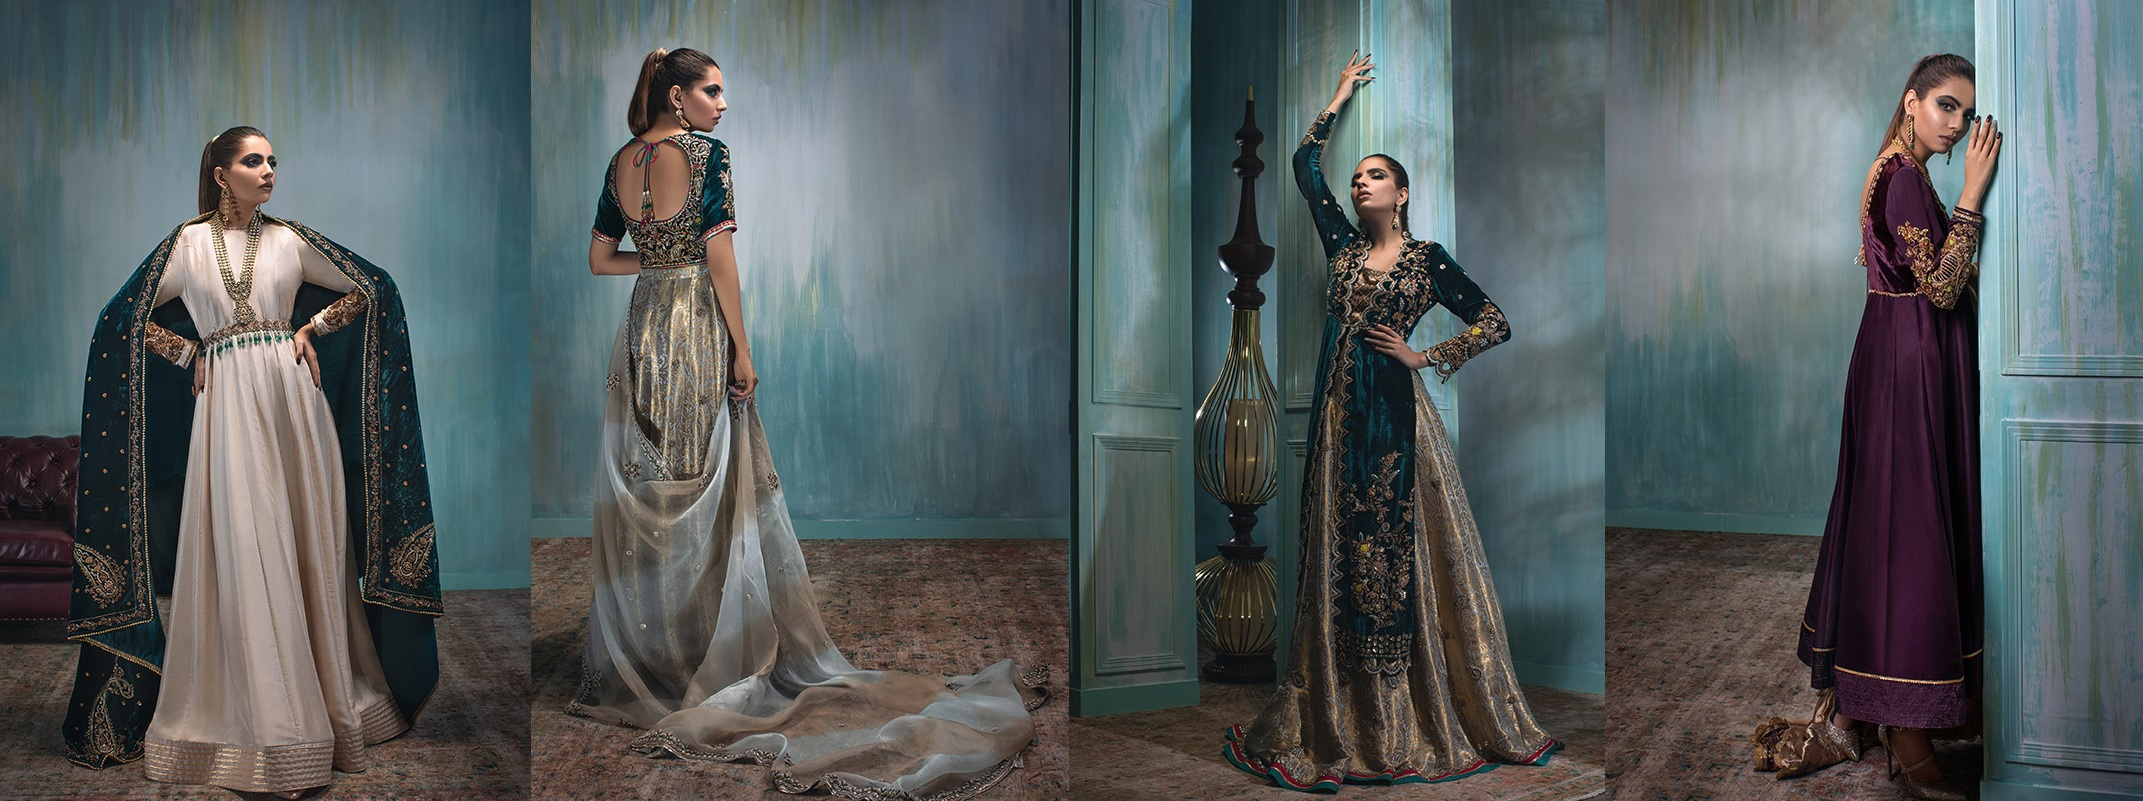 Momina Teli Le Monarque Privee Wedding Formals Collection (2)